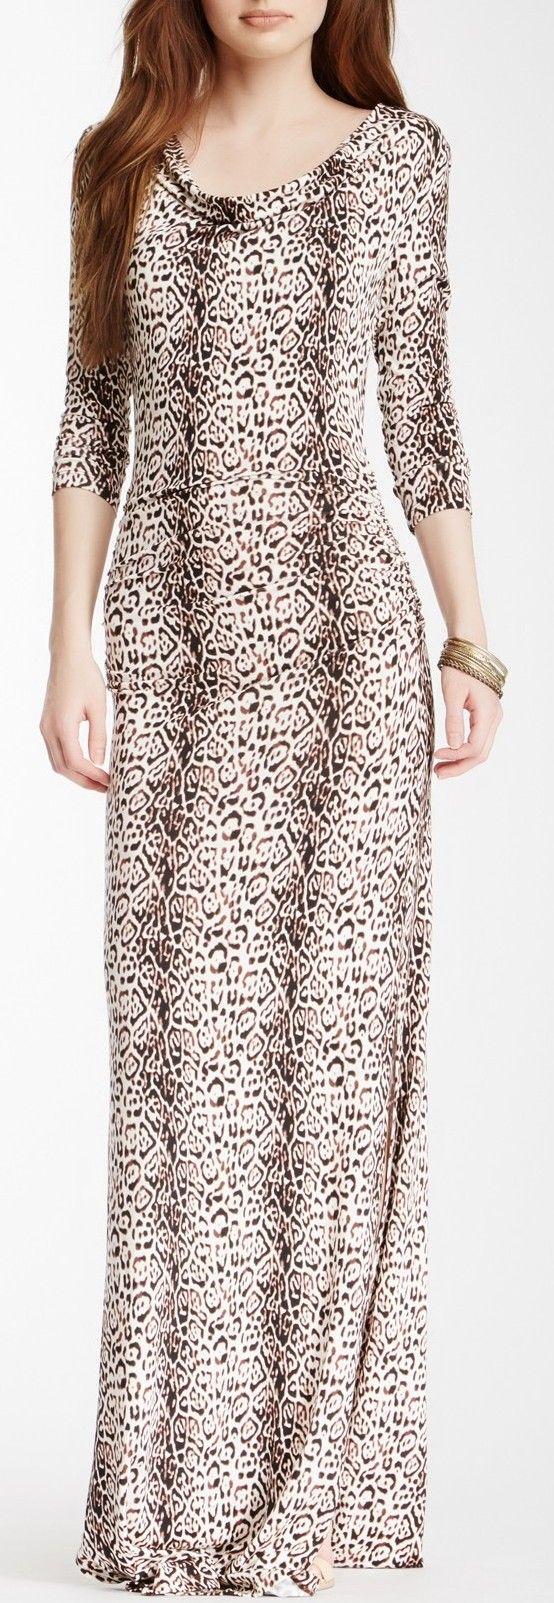 Kells Maxi Dress